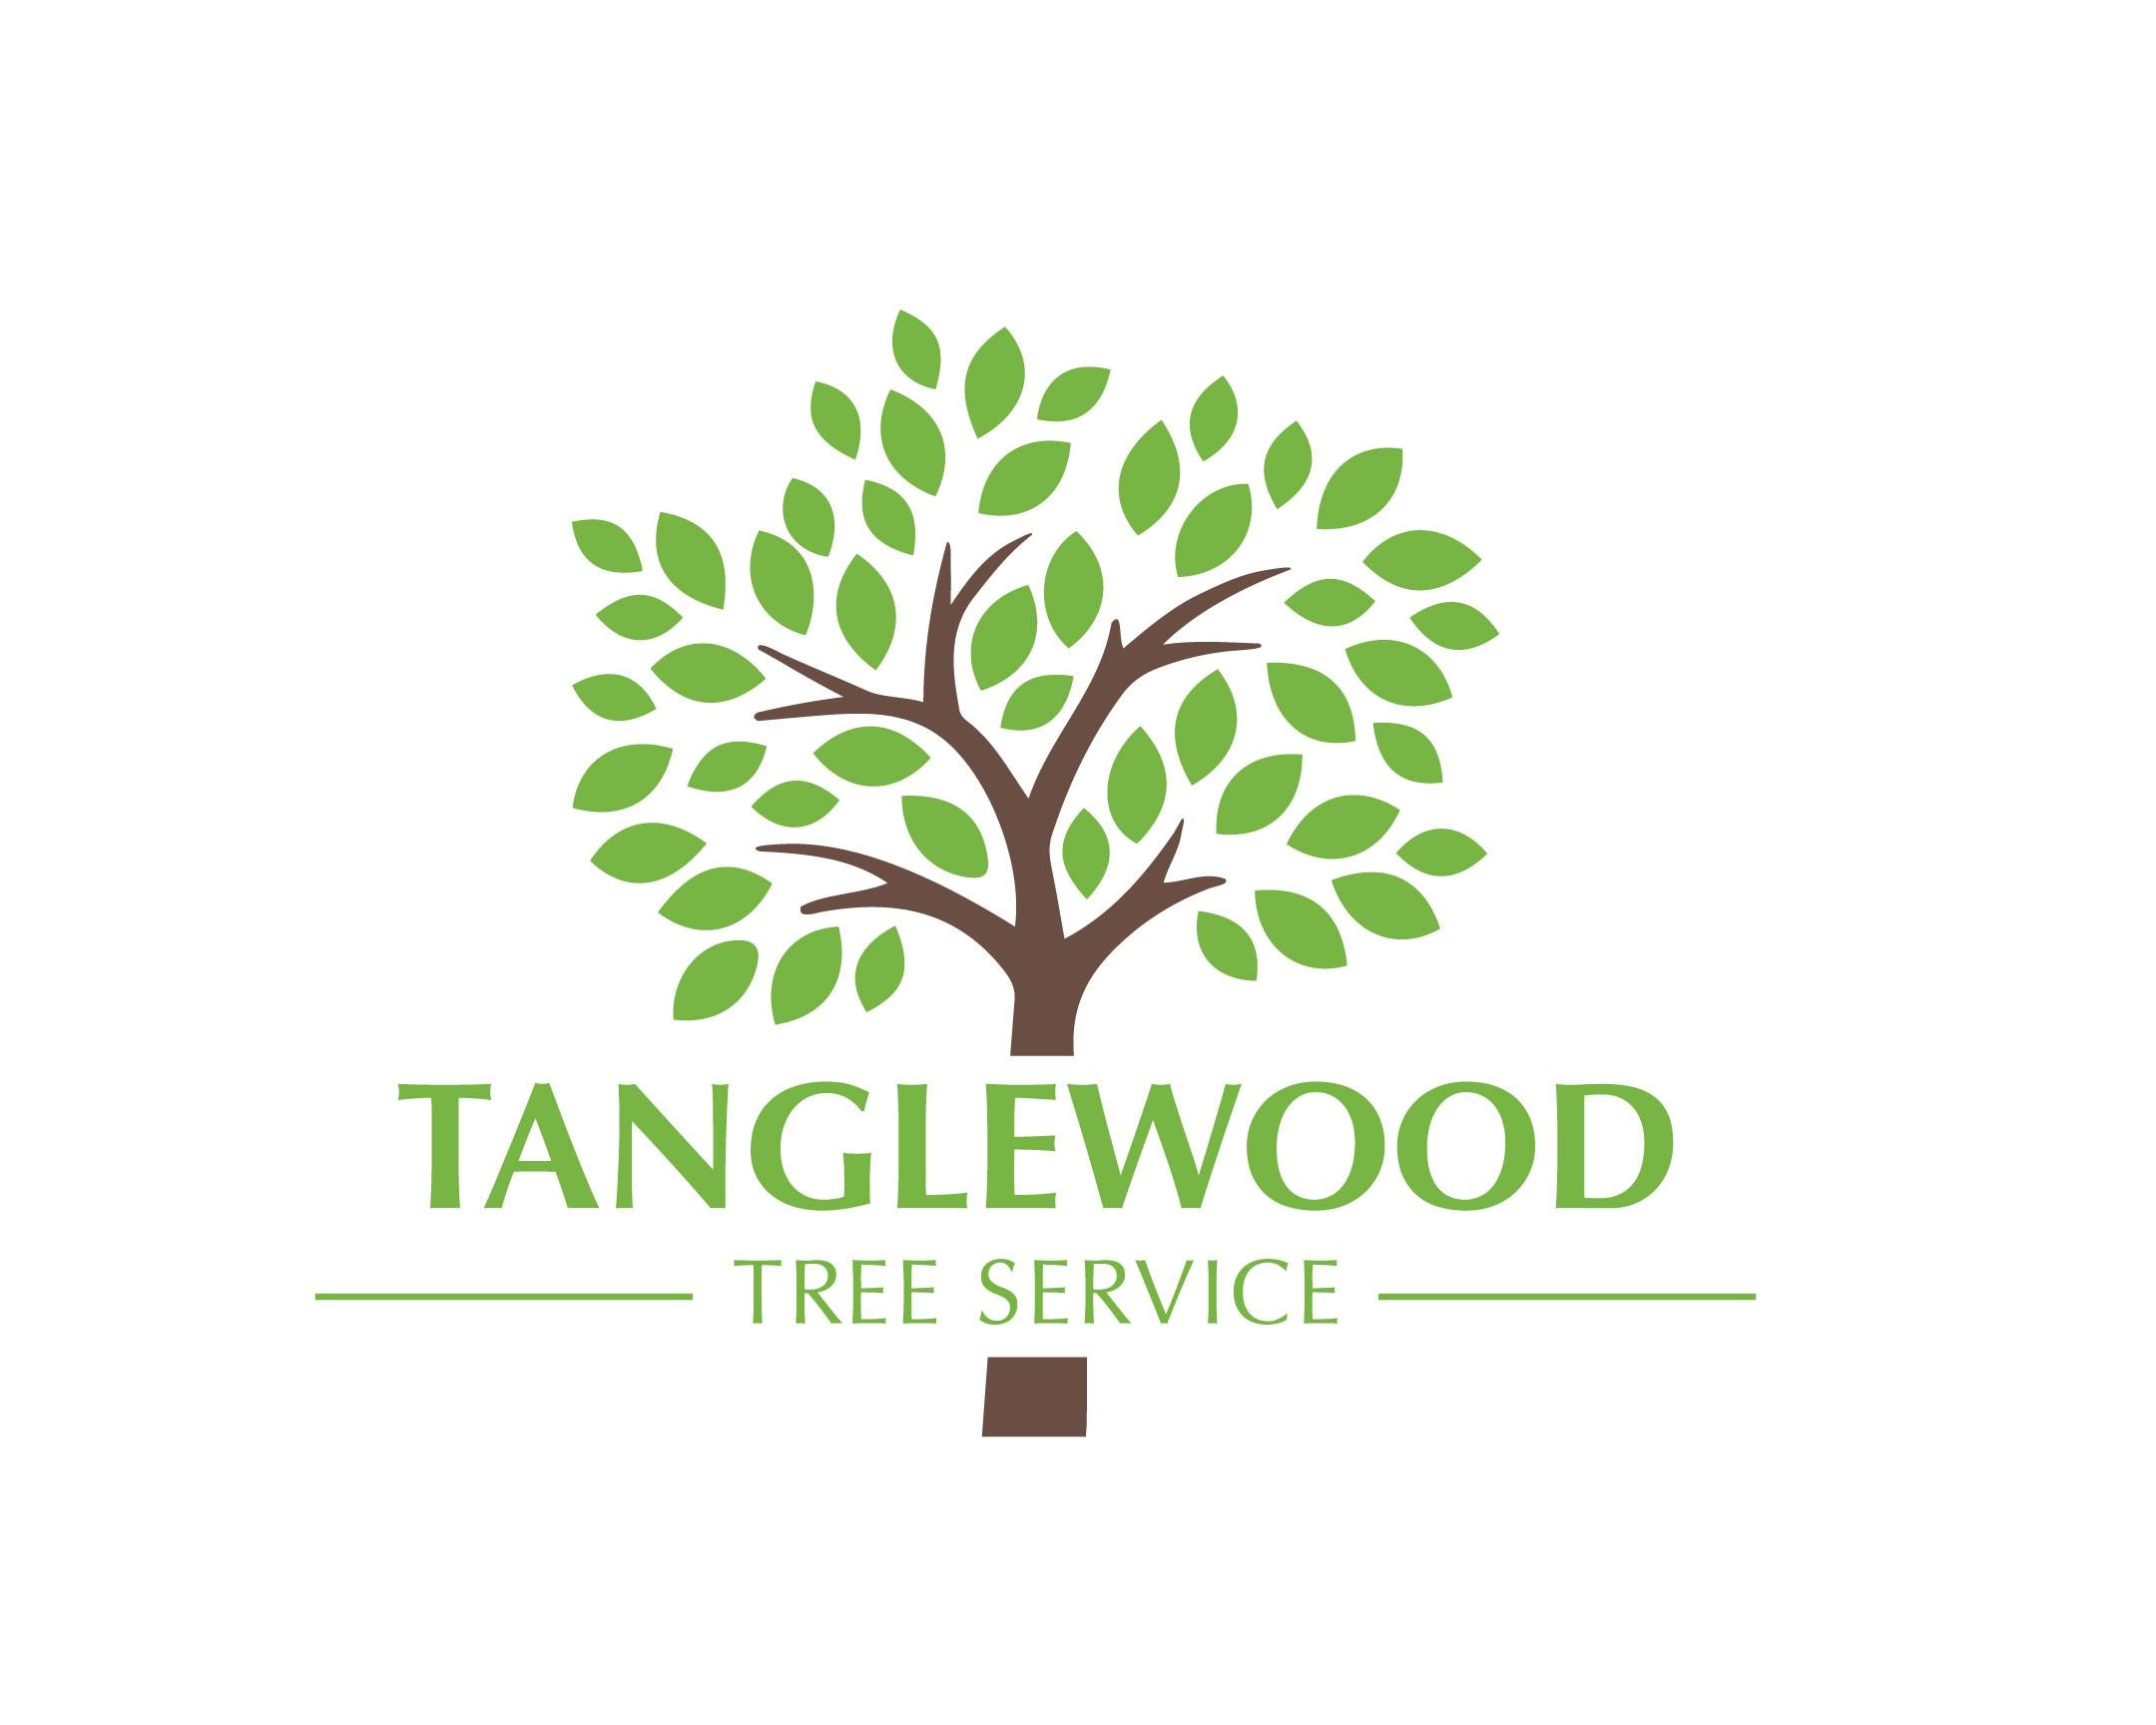 Tanglewood Tree Service image 2